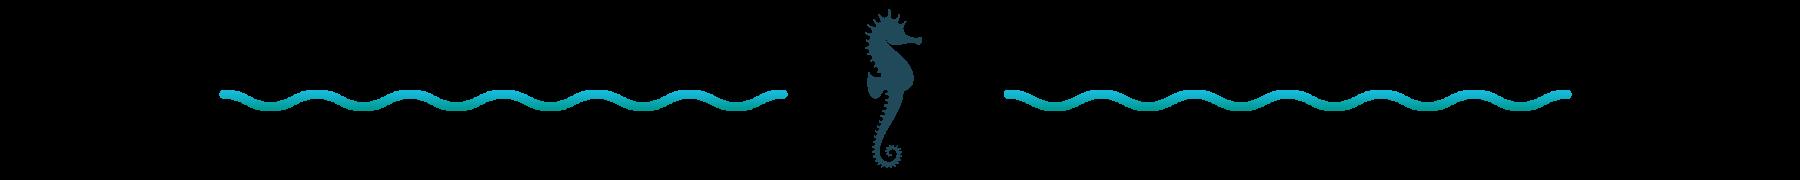 Decorative seahorse divider